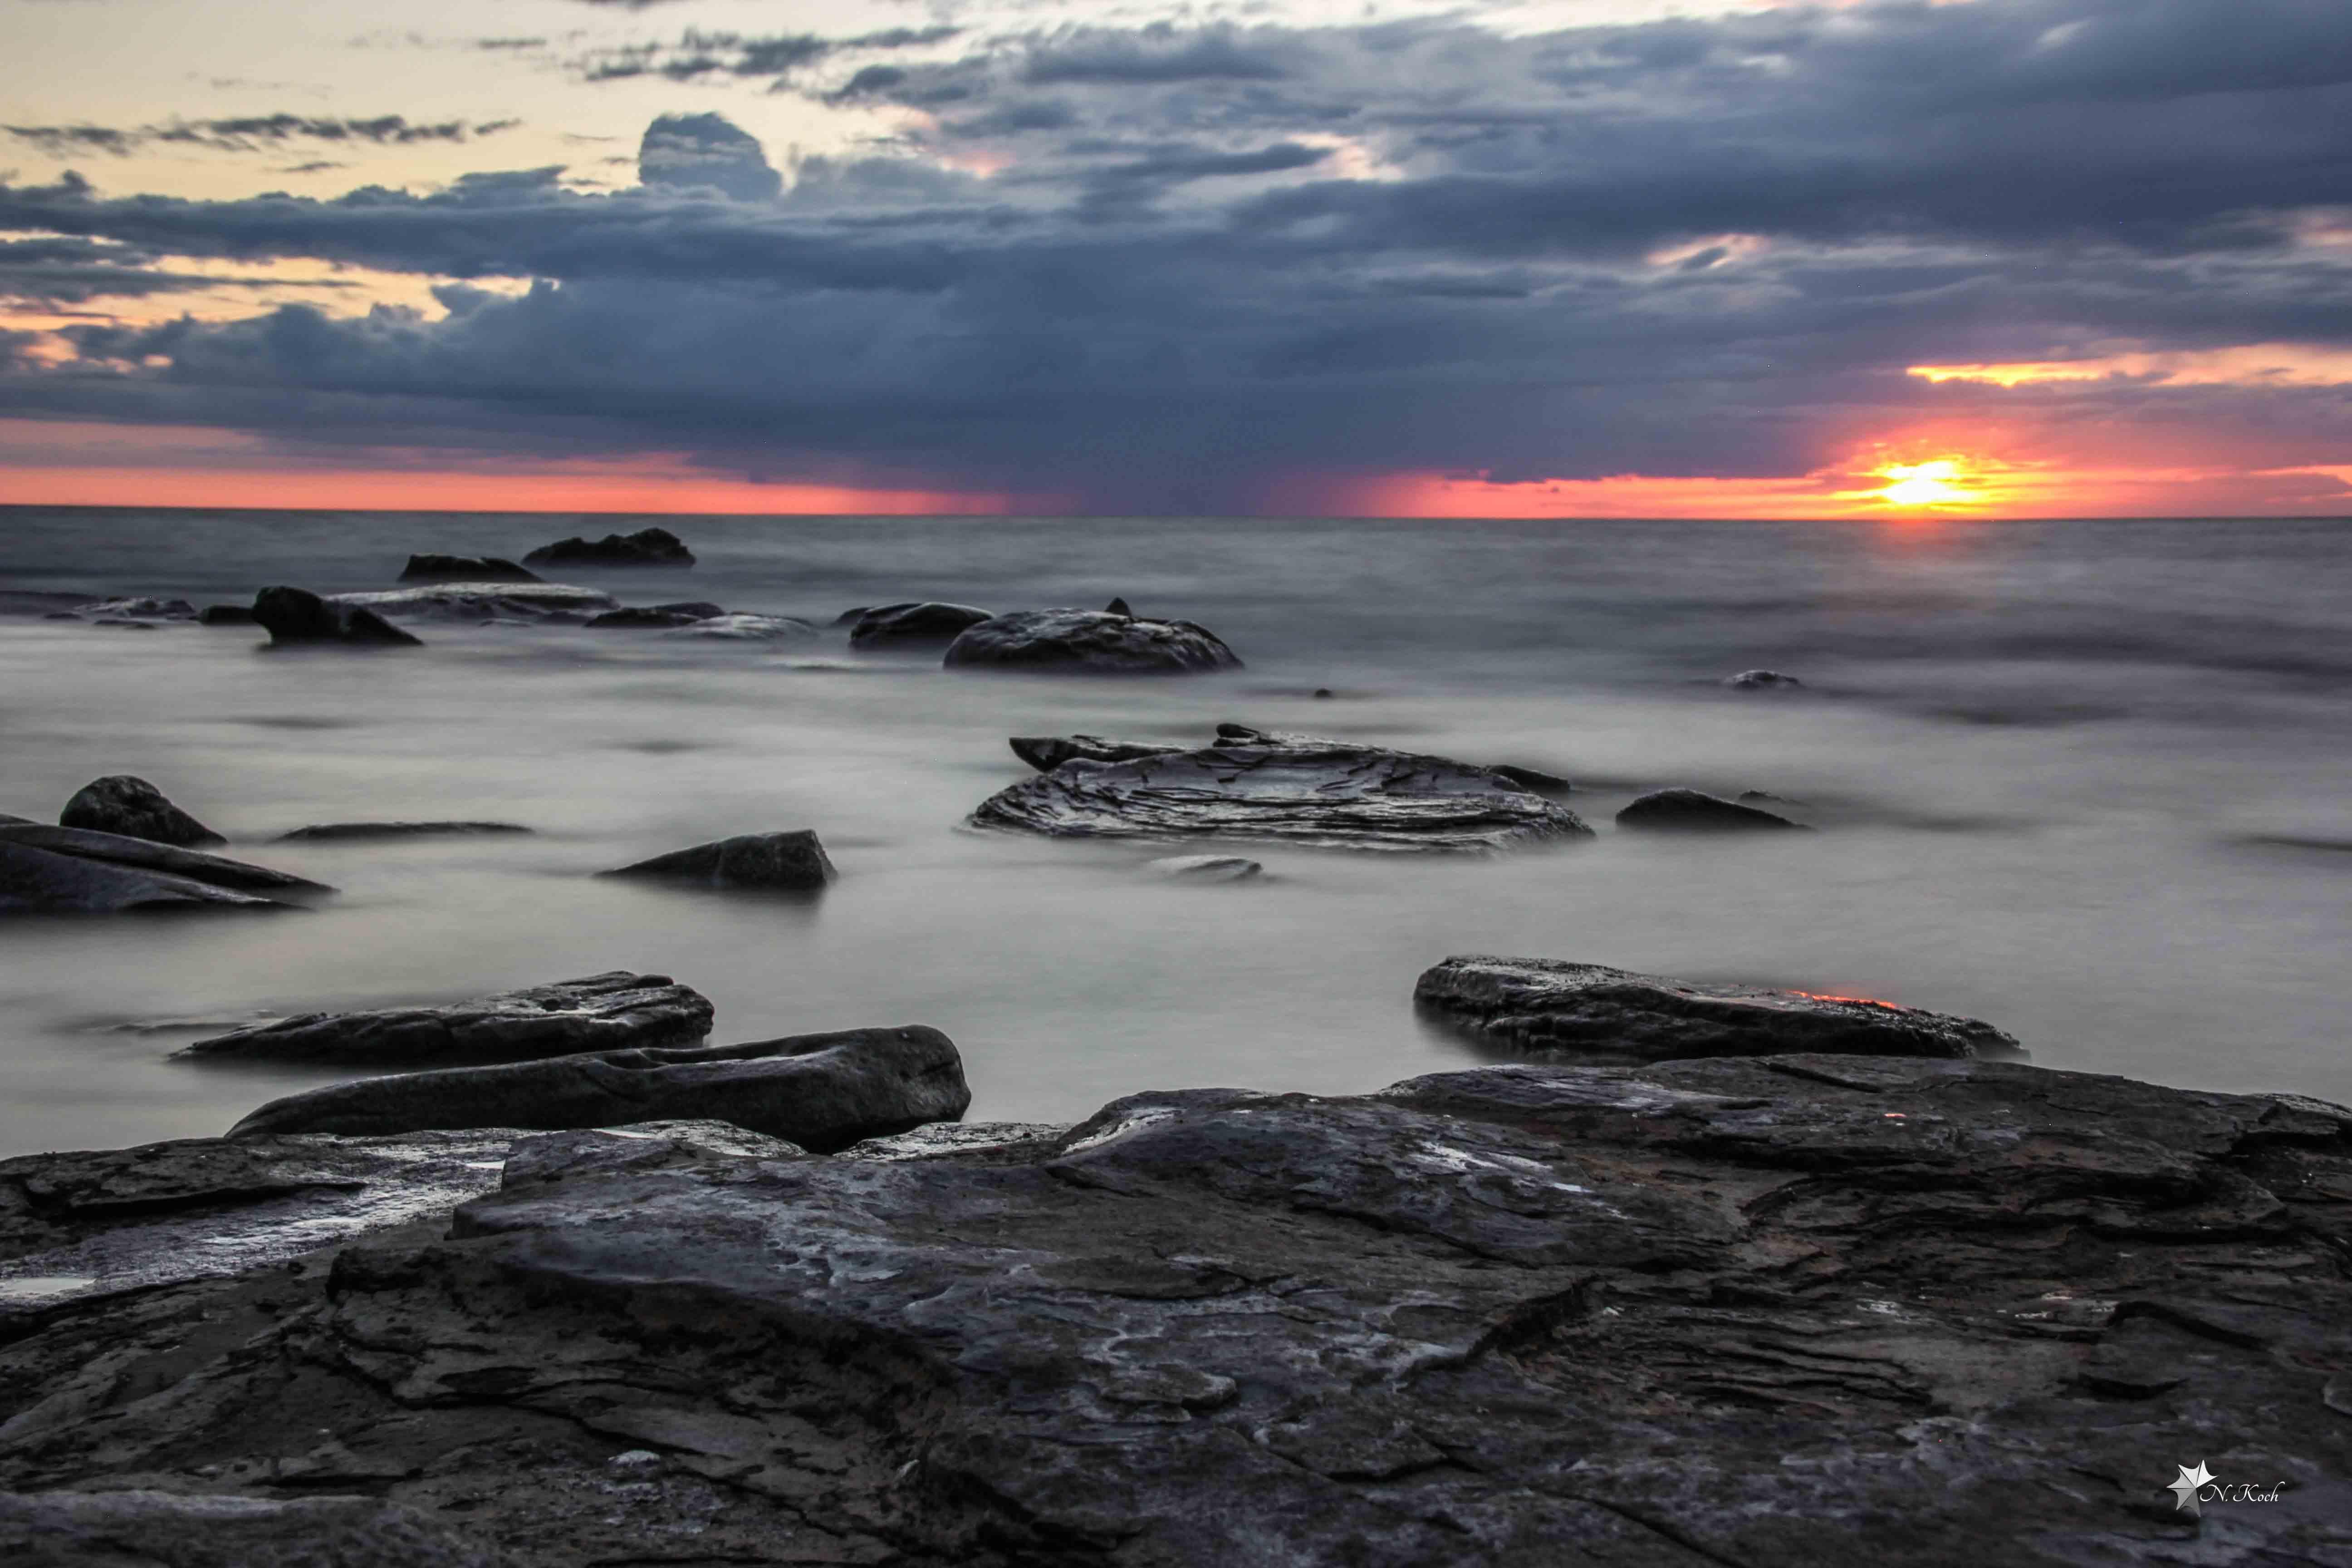 2014, Sweden | Stormy sea on Gotland